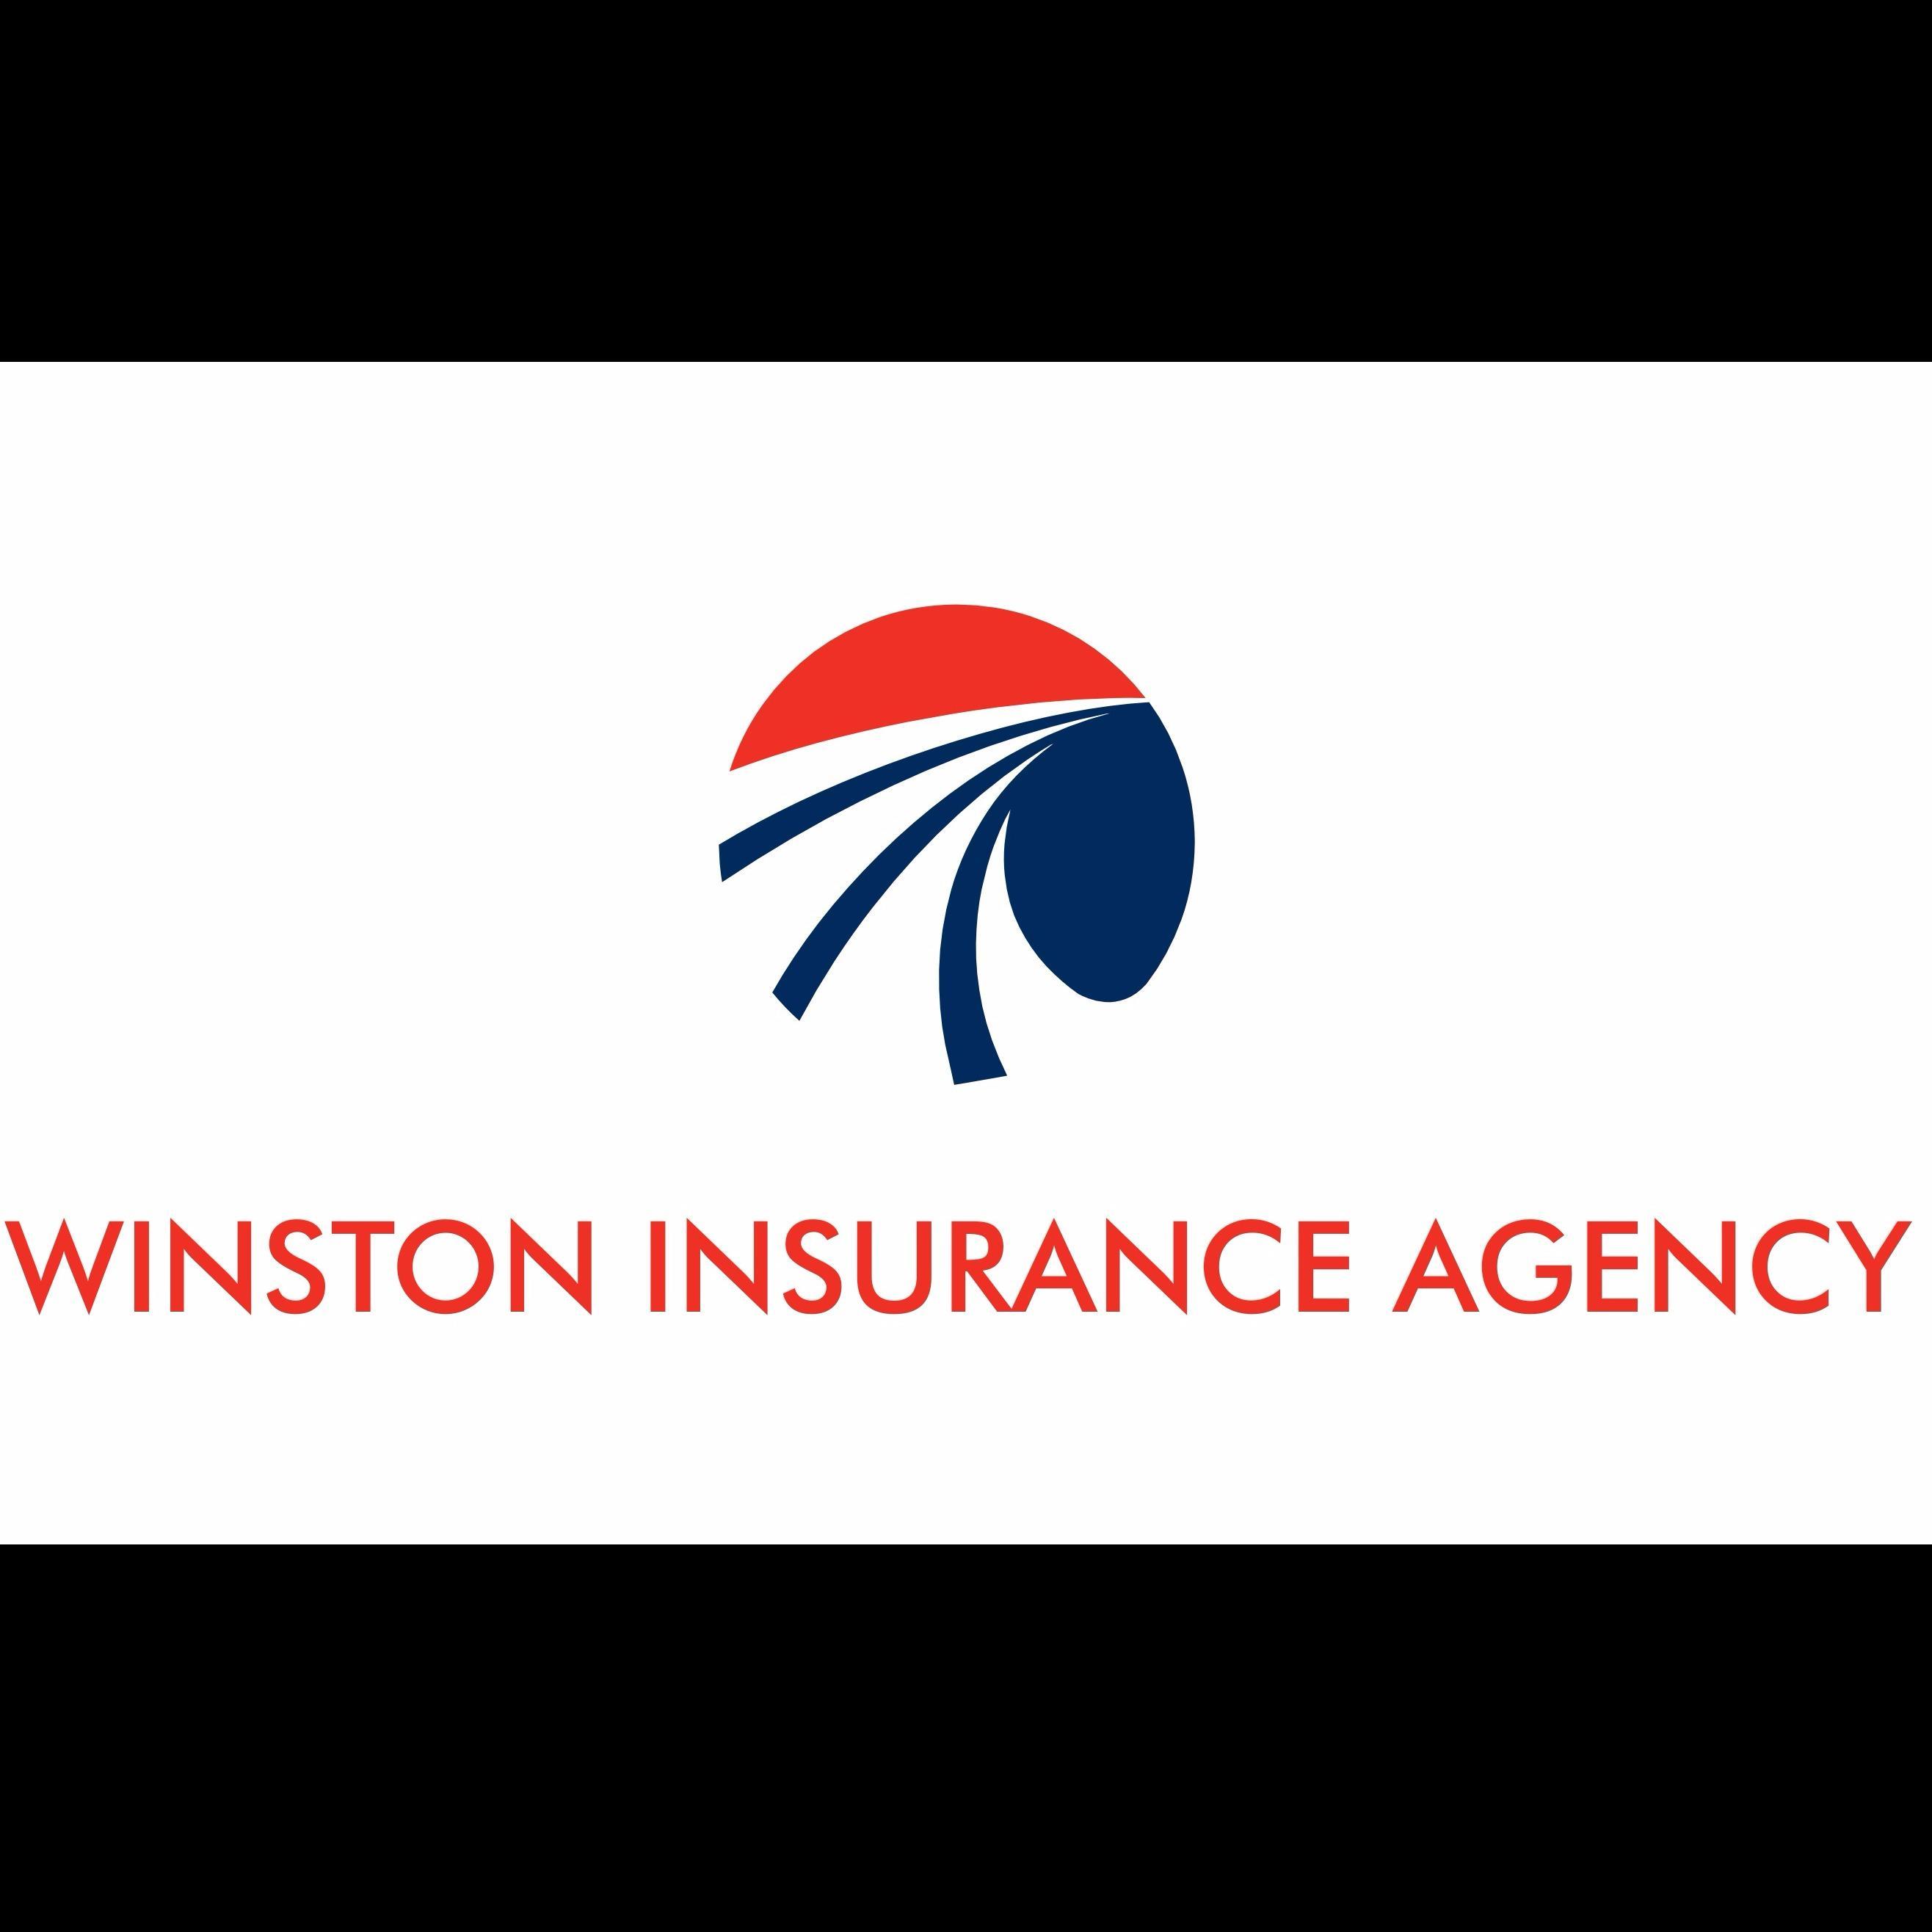 Winston Insurance Agency